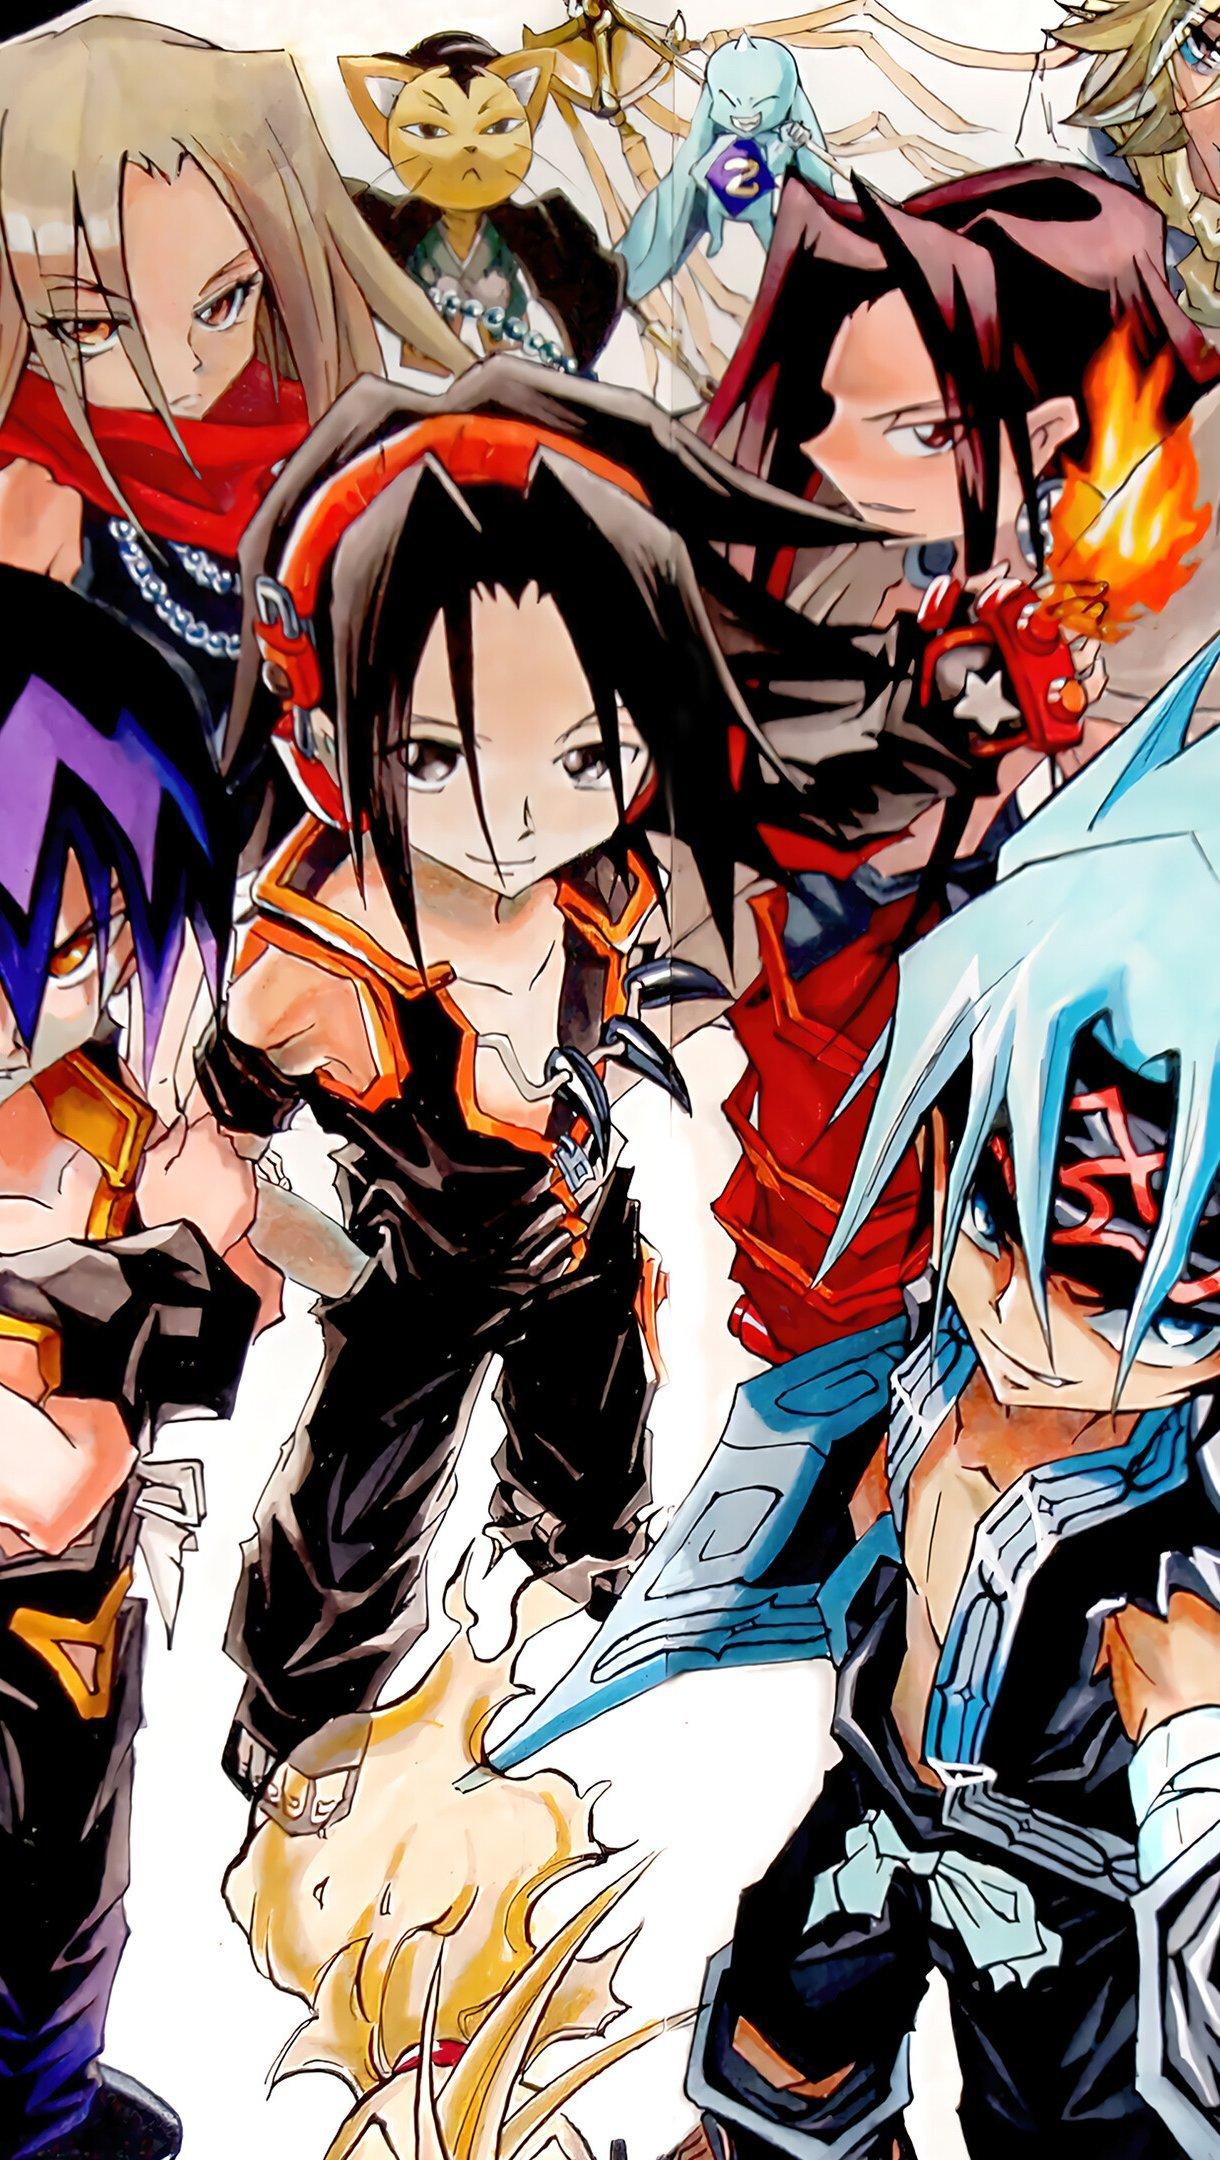 Anime Wallpaper Shaman King Characters Vertical